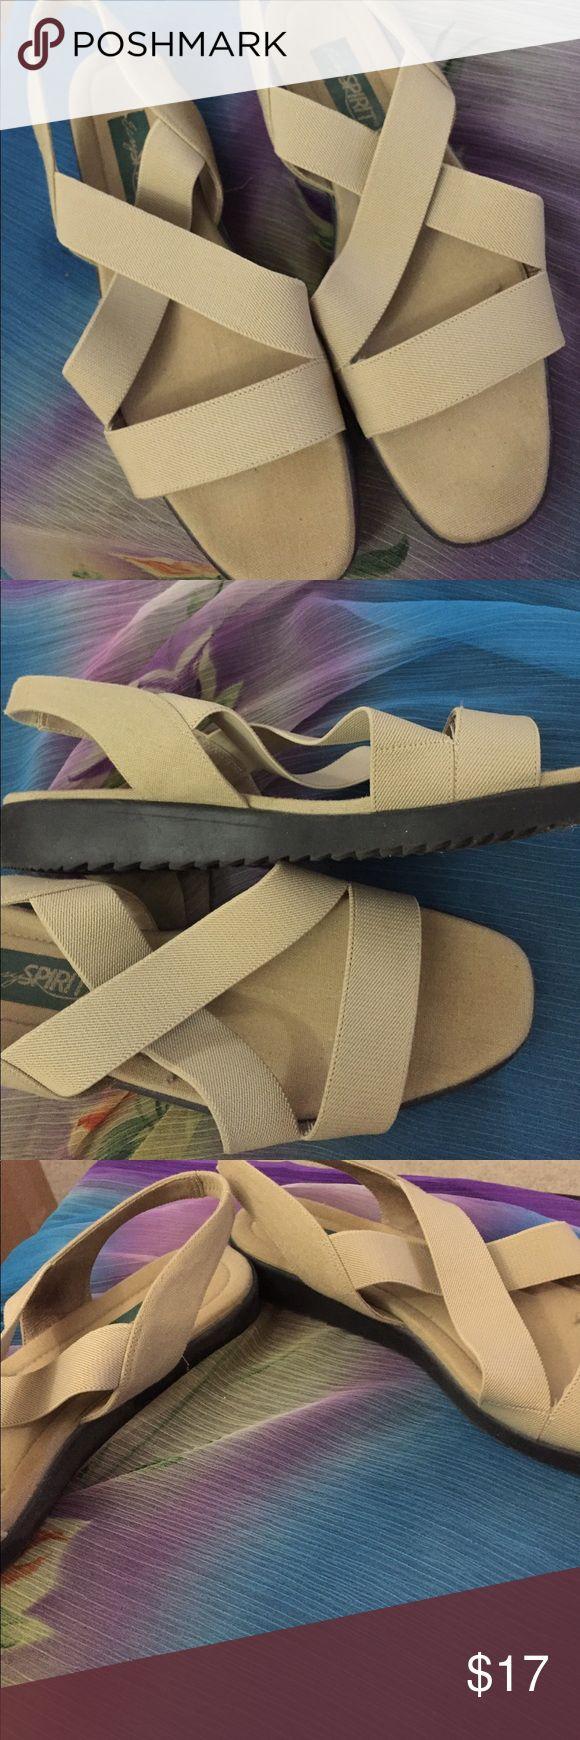 Easy spirit sandals anti-shock Great condition stretch rear strap. Easy Spirit Shoes Sandals